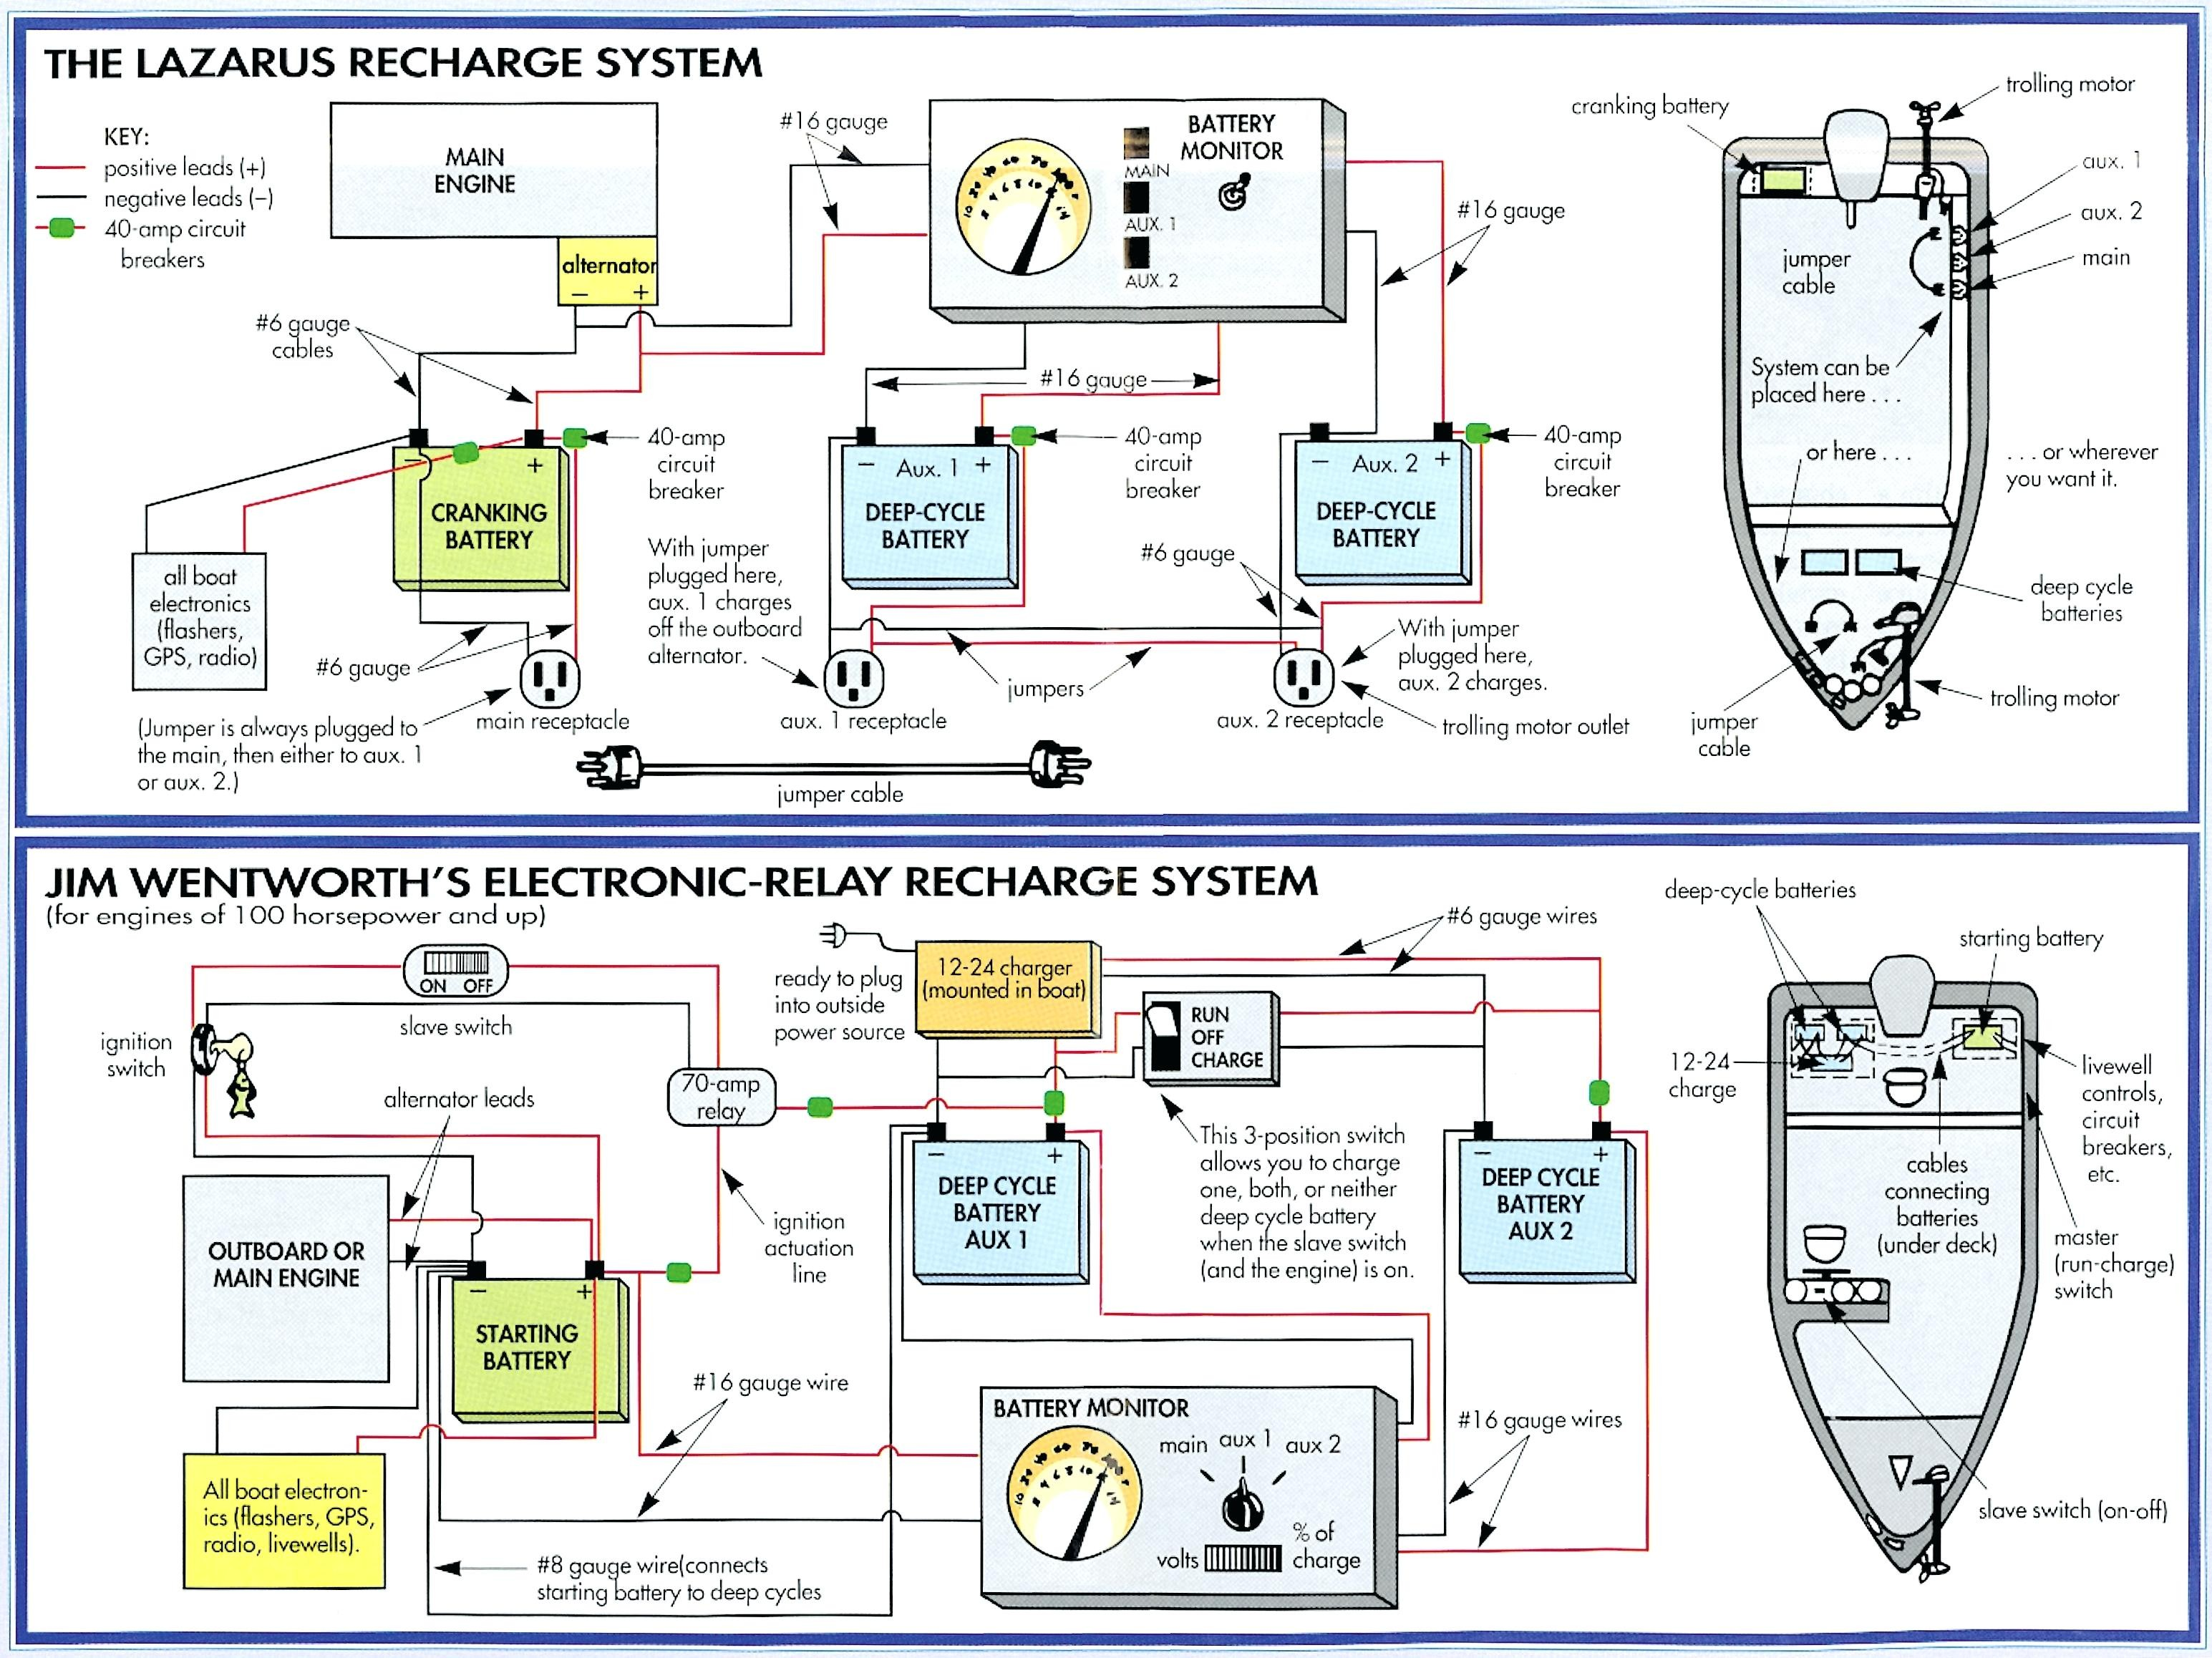 Boat Dual Battery Wiring Diagram Blue Sea 7601 Marine Vsr ... Acr Wiring Diagram Boat on